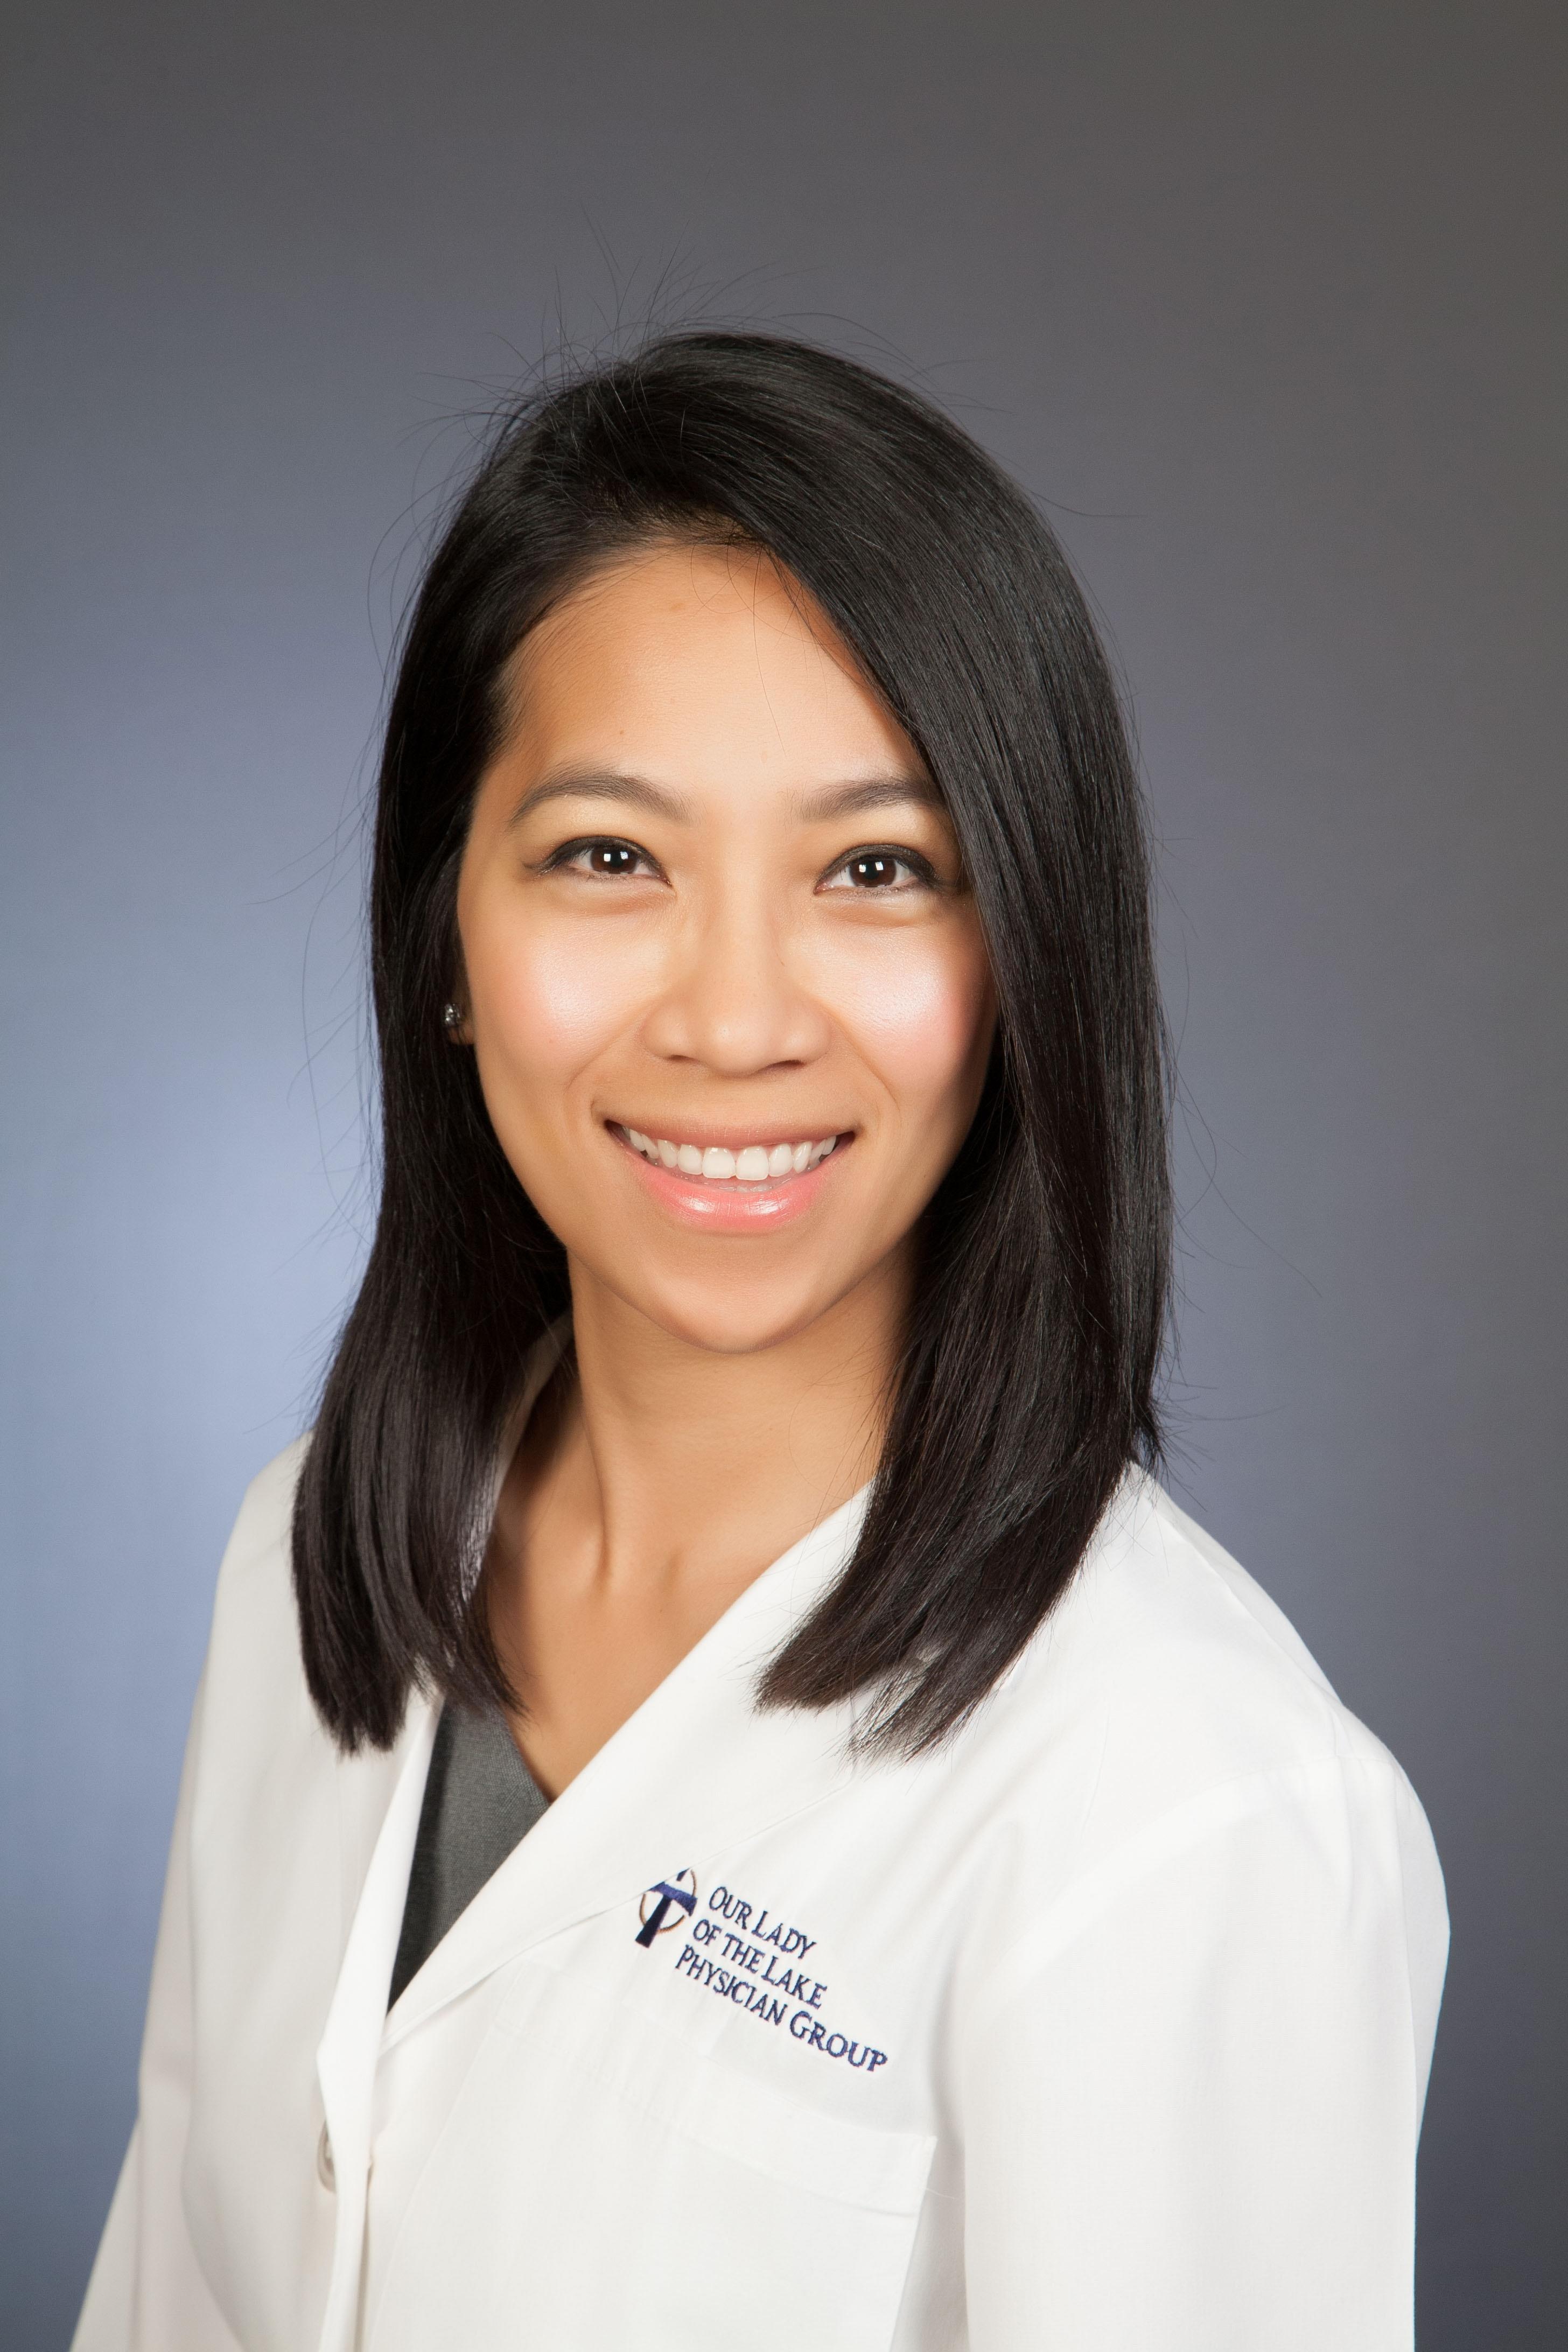 AnhThao Nguyen, M.D.